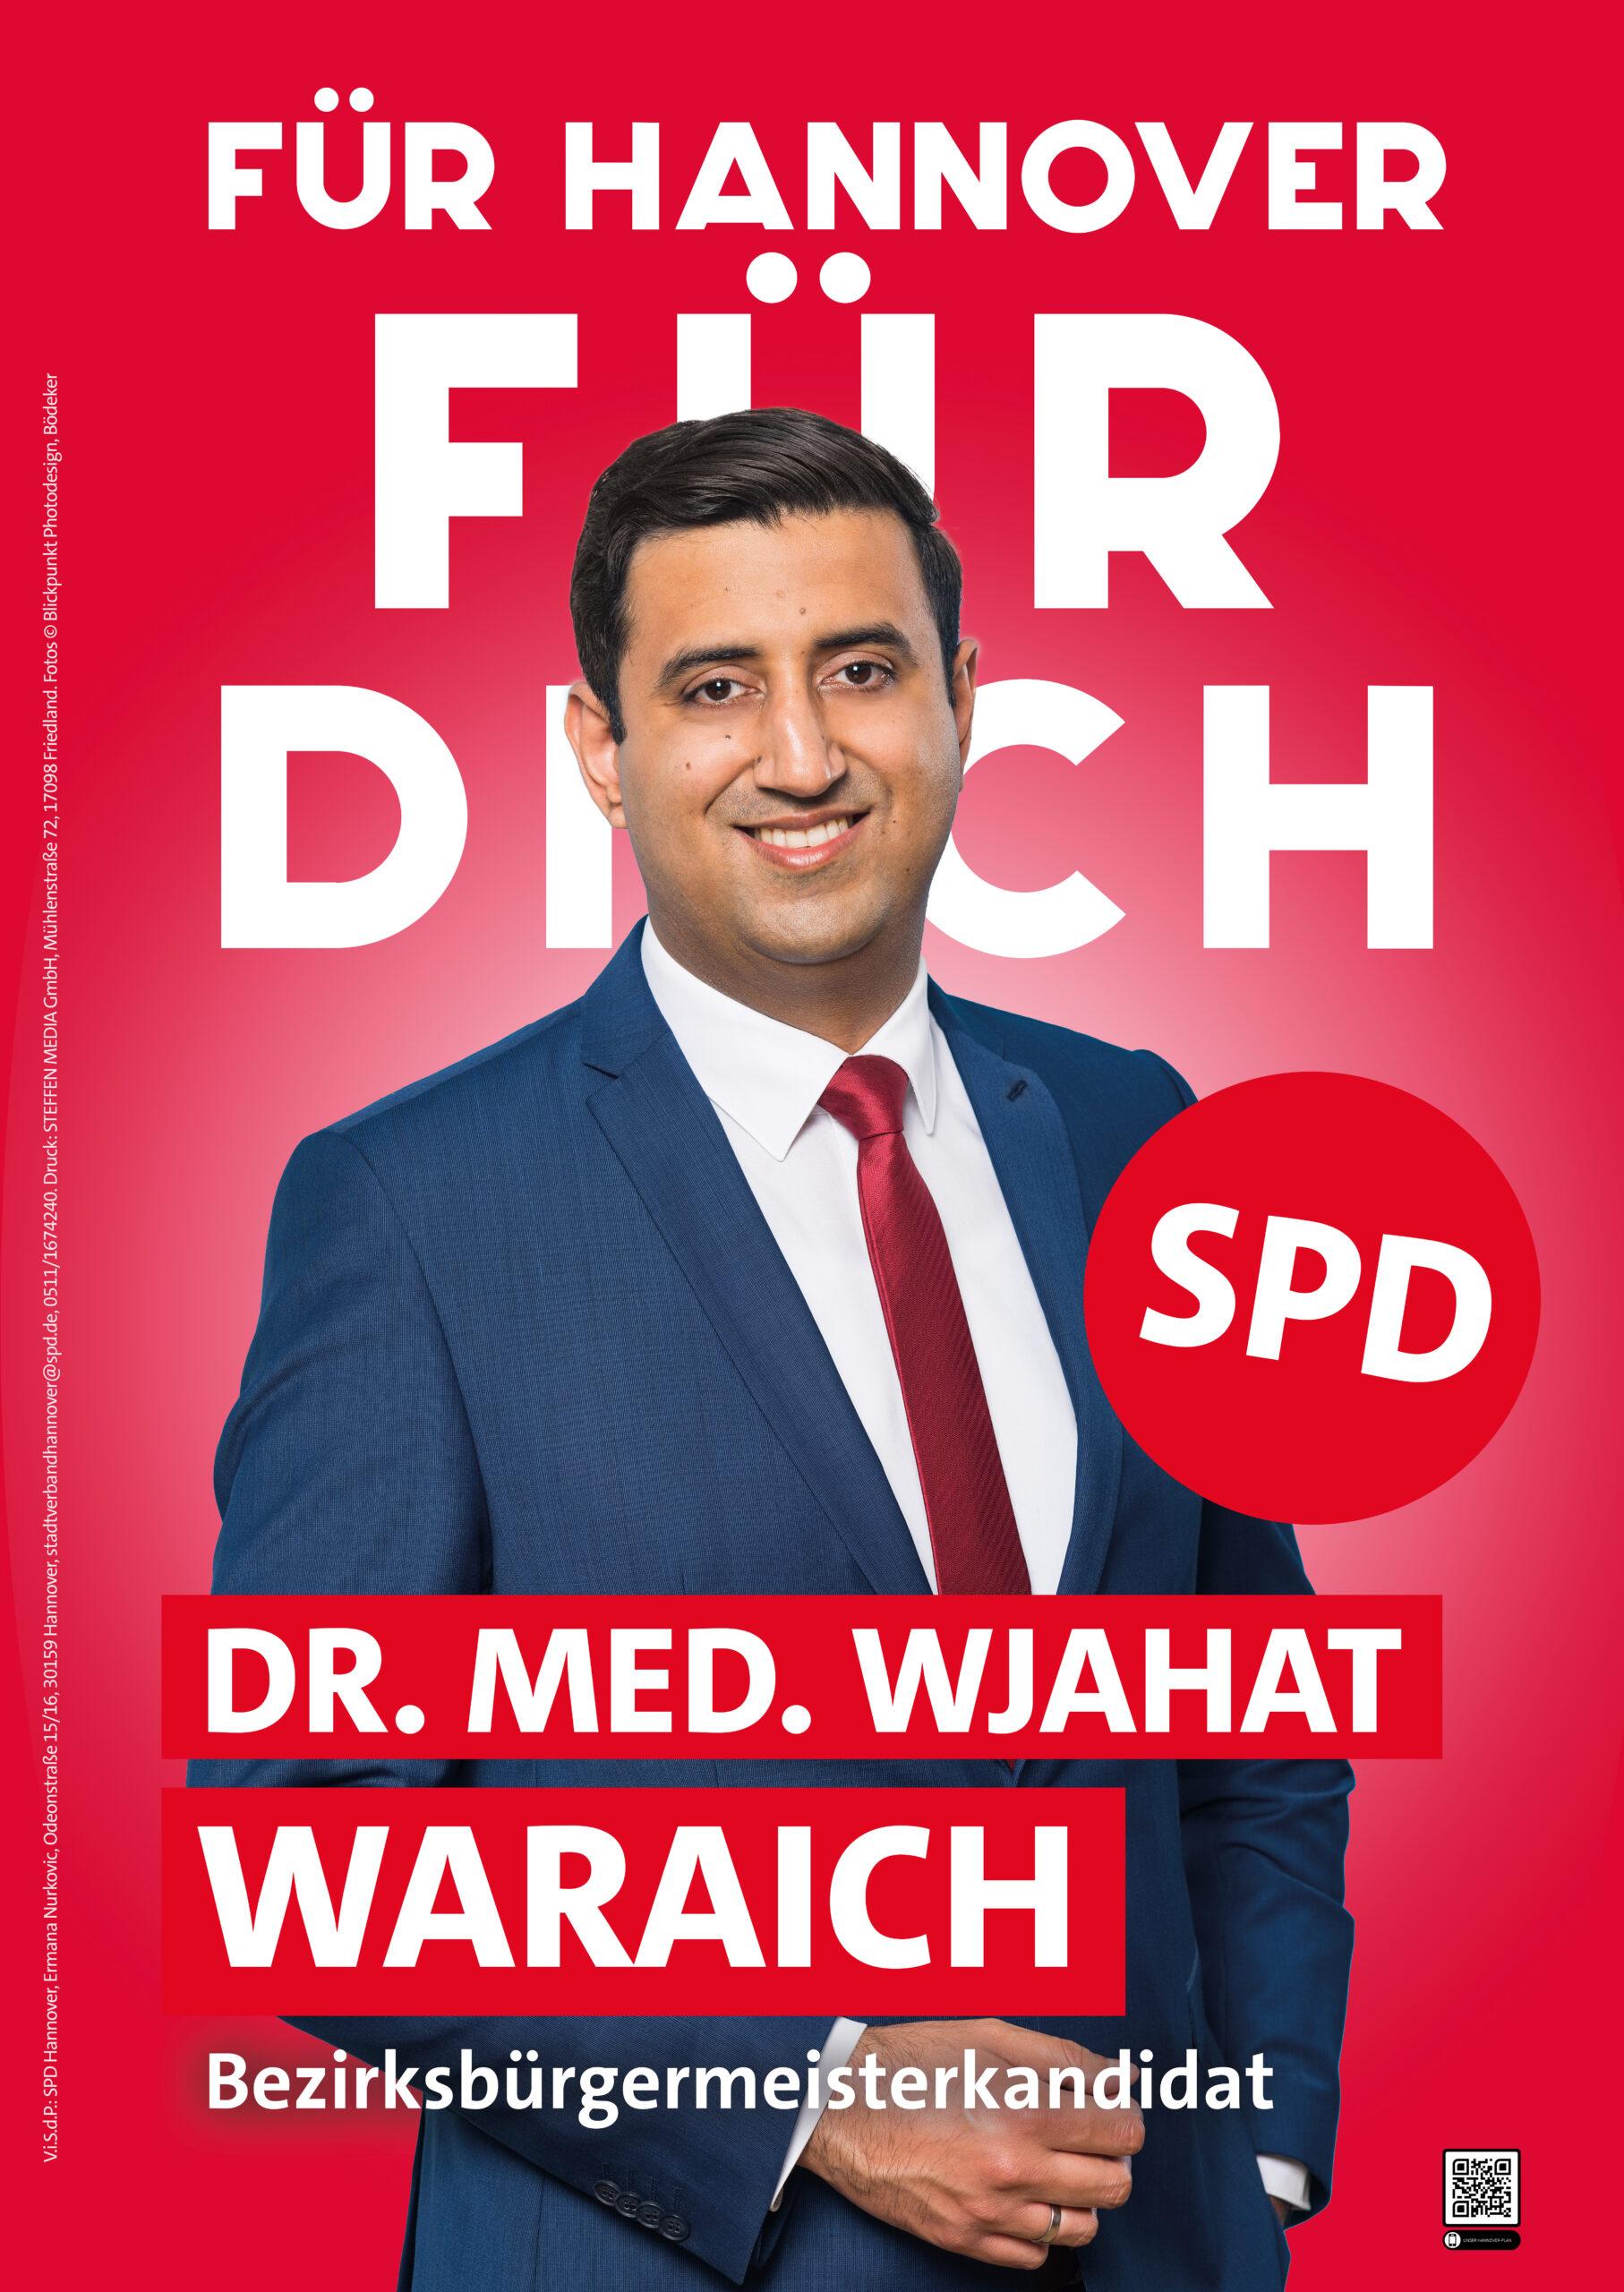 Wahlplakat Dr. Wjahat Waraich